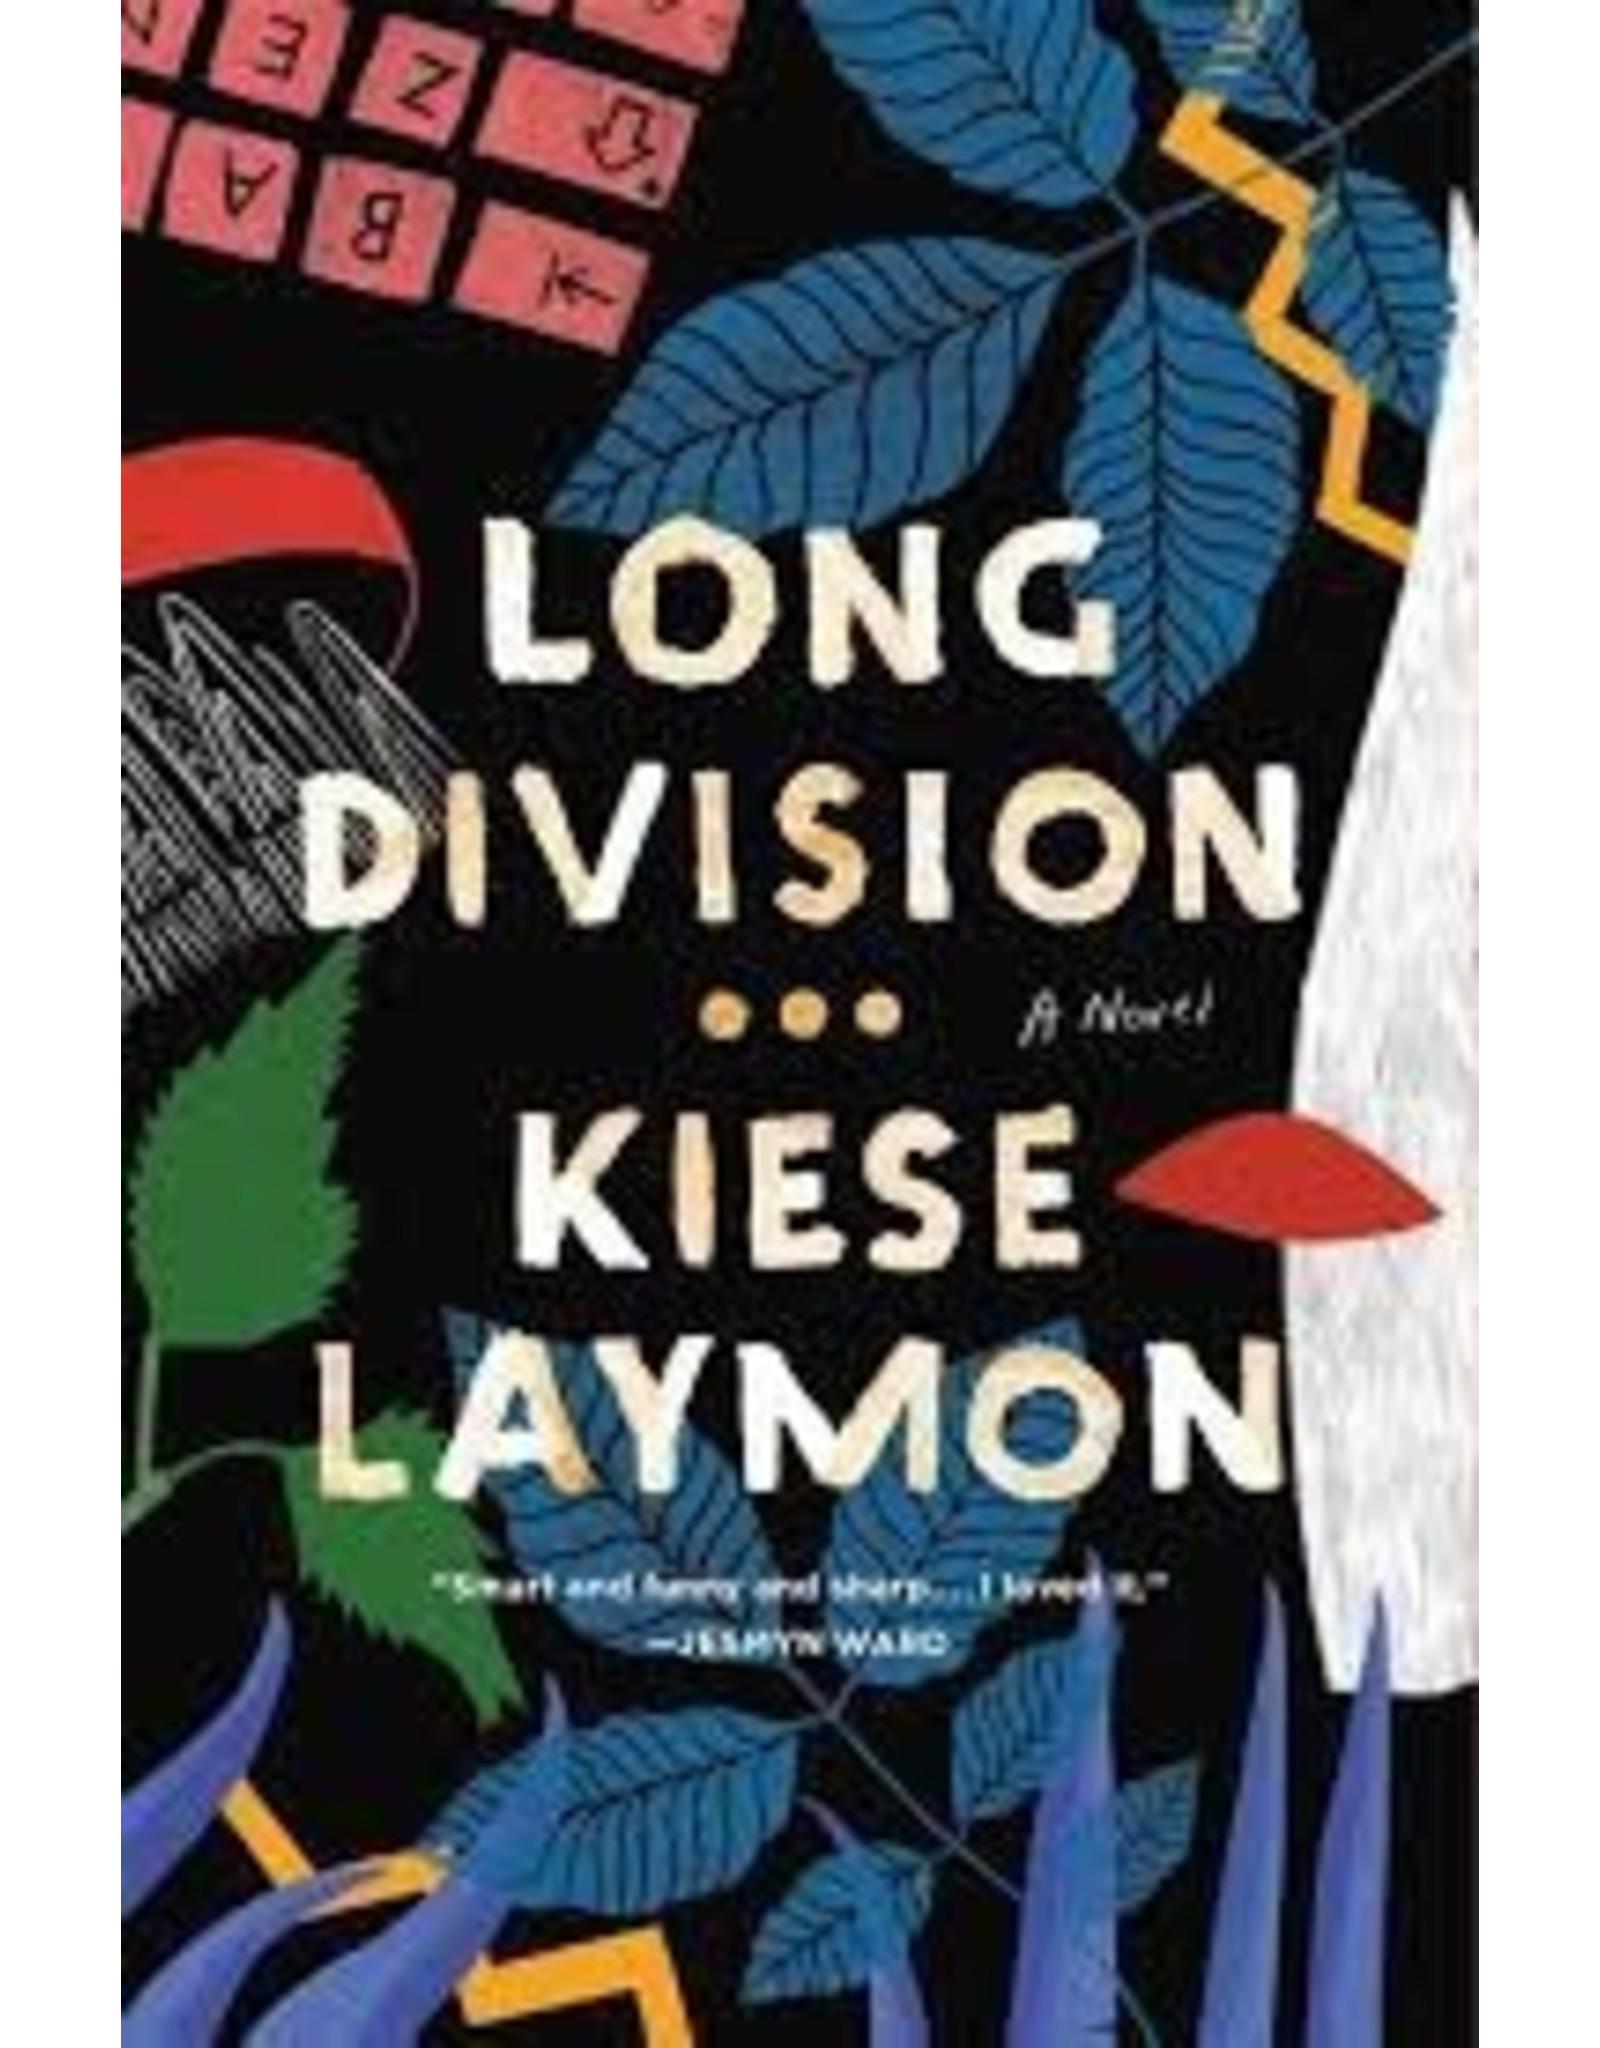 Books Long Division: A Novel by Kiese Laymon